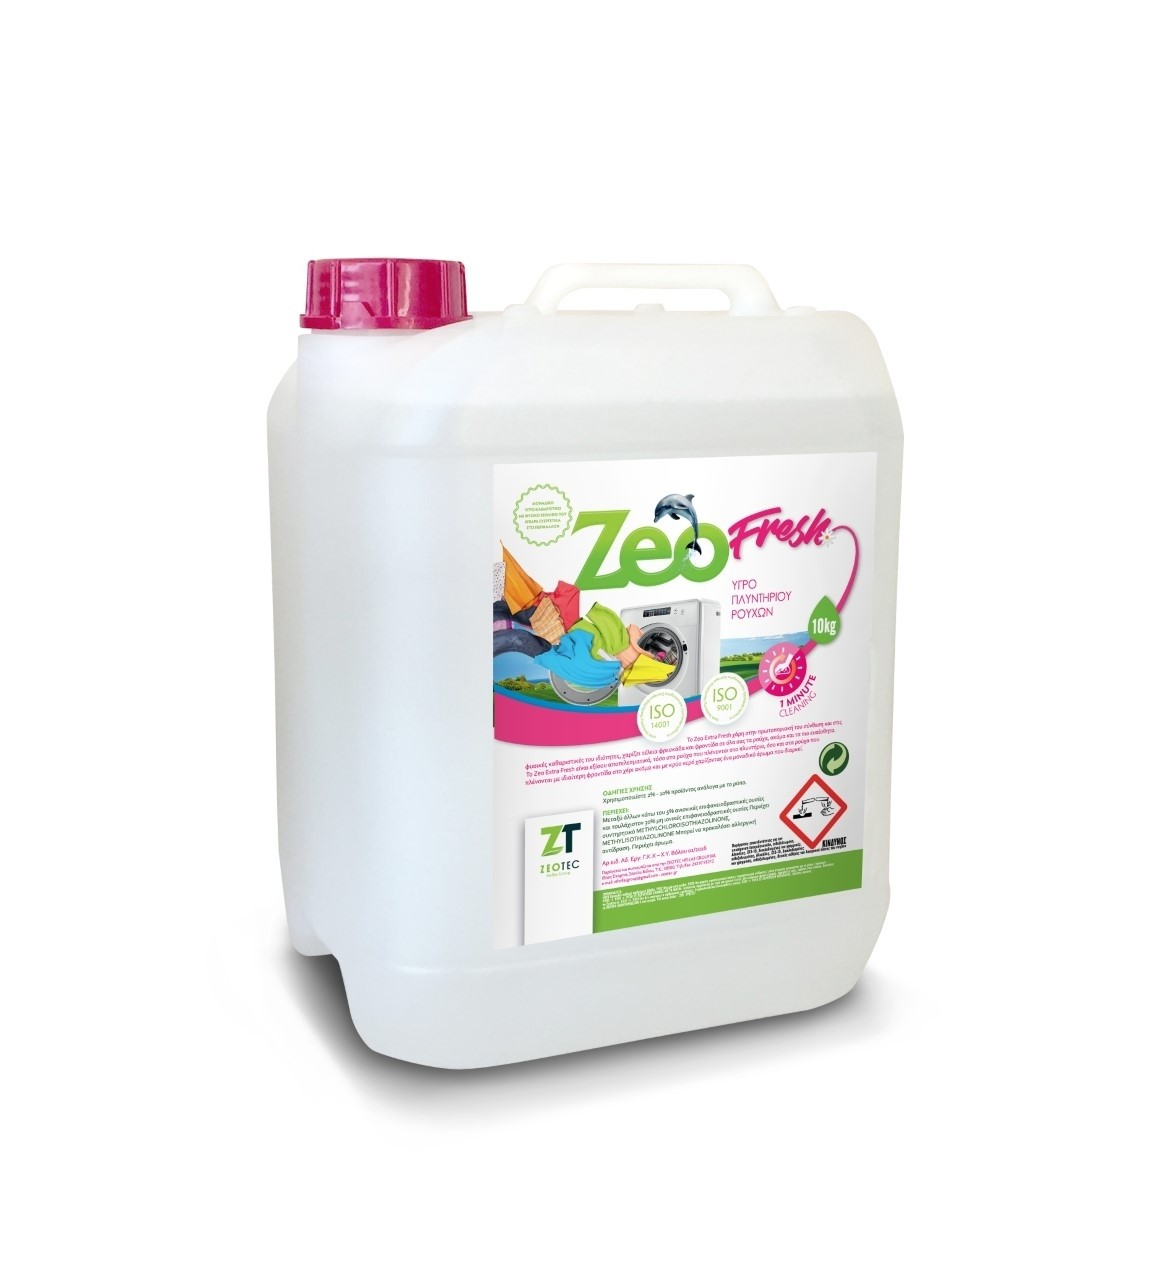 Zeo Fresh - Υγρό απορρυπαντικό ρούχων 10lt